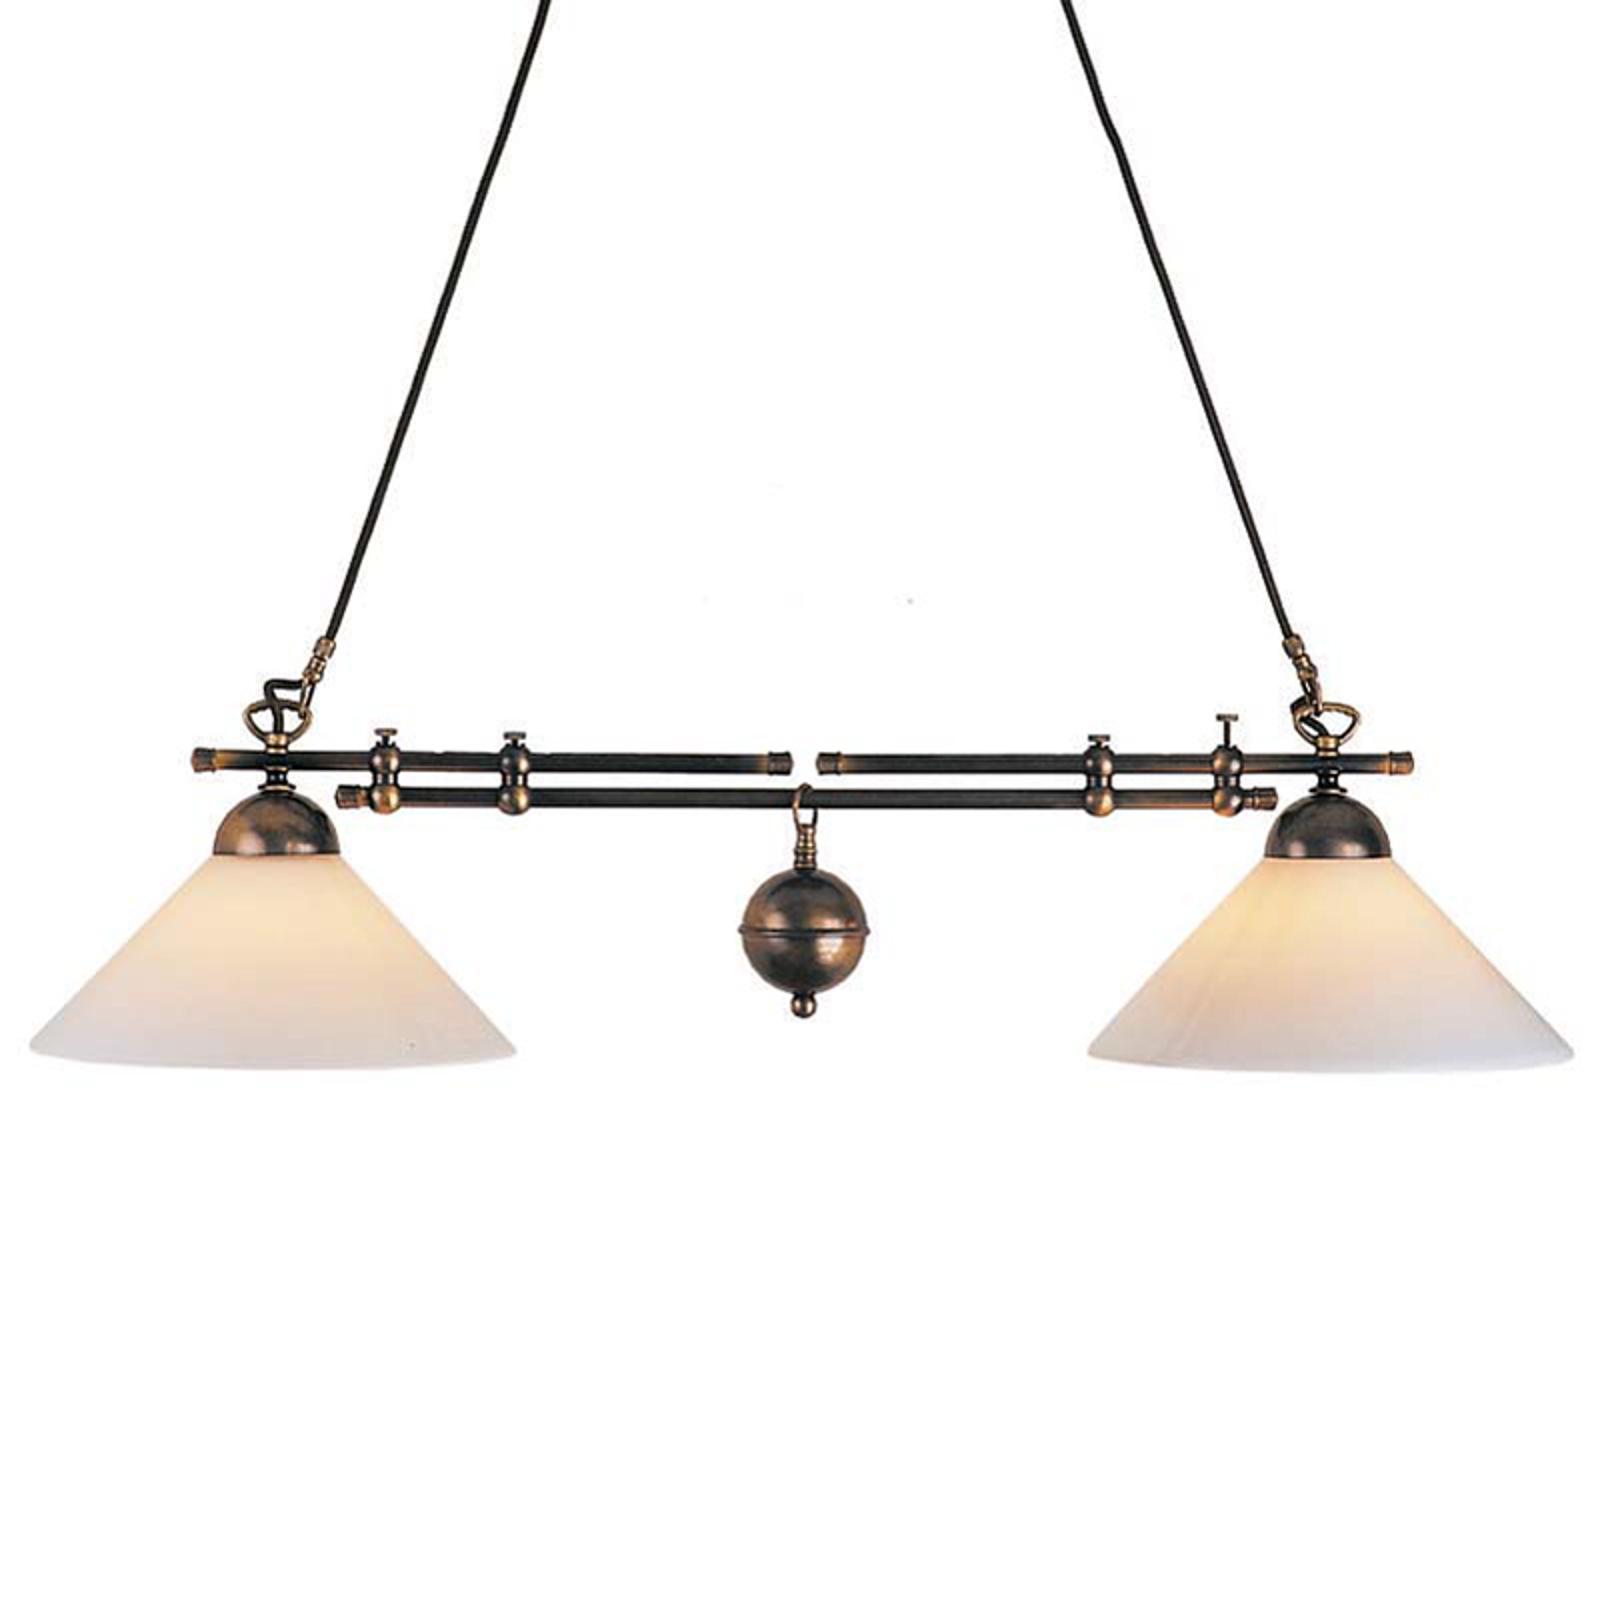 Balkpendellamp Anno 1900 - 2-lichts